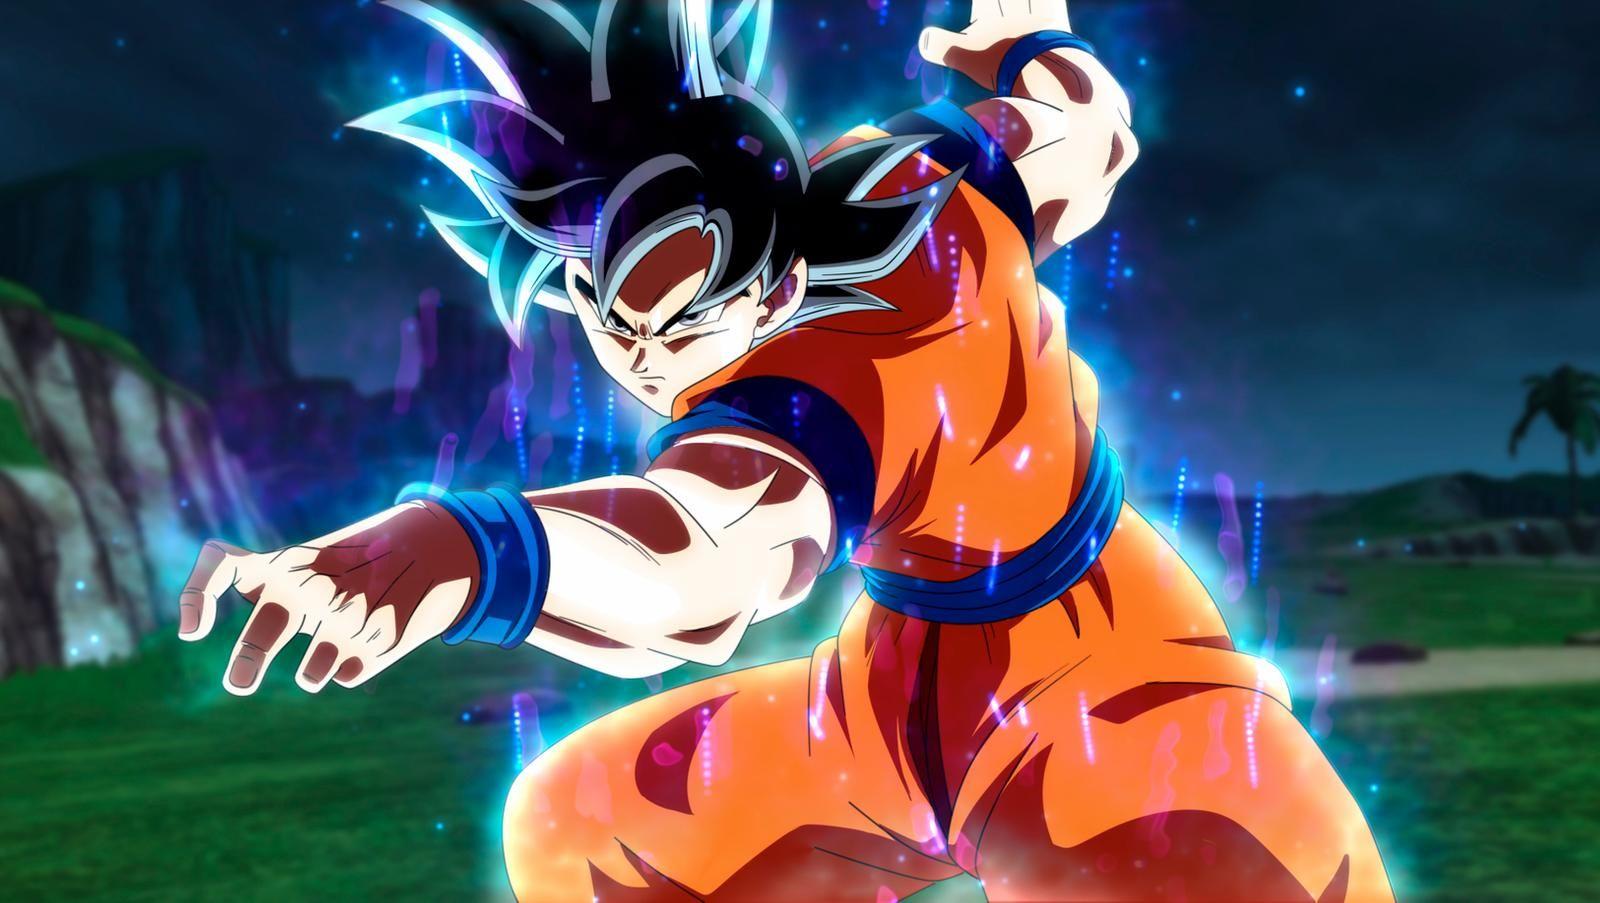 Goku Ultra Instinct Sign Manga 59 By Alejandrodbs On Deviantart In 2020 Dragon Ball Super Manga Anime Dragon Ball Super Dragon Ball Super Goku